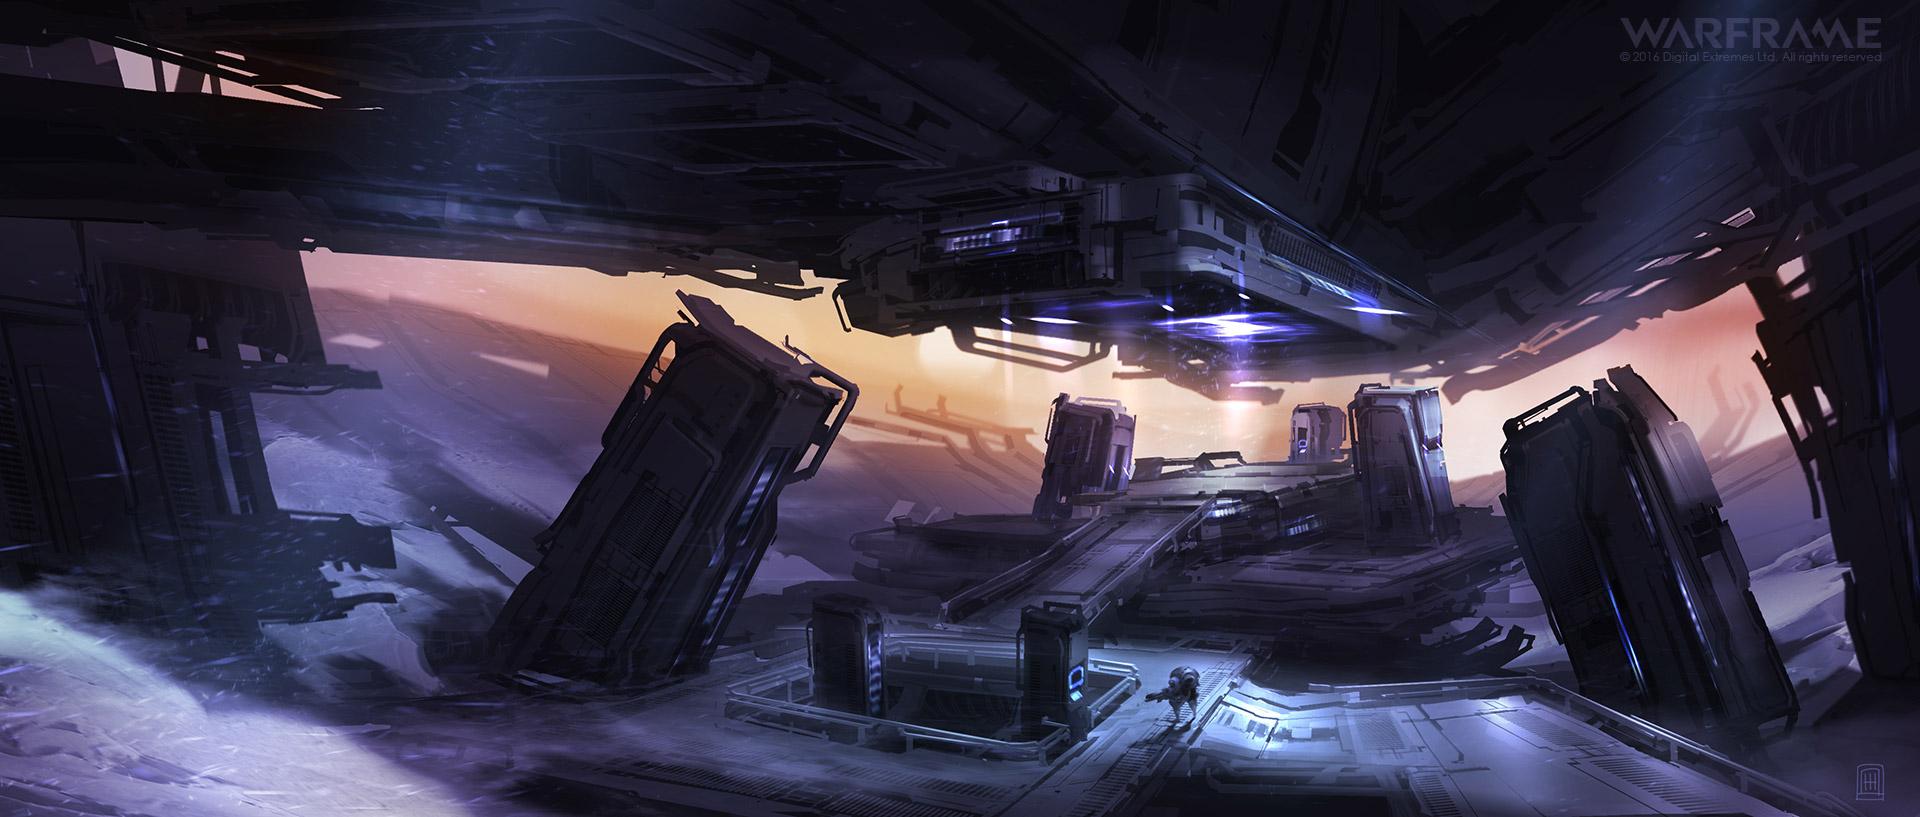 Warframe_Corpus_IcePlanet_ShipInt_AE